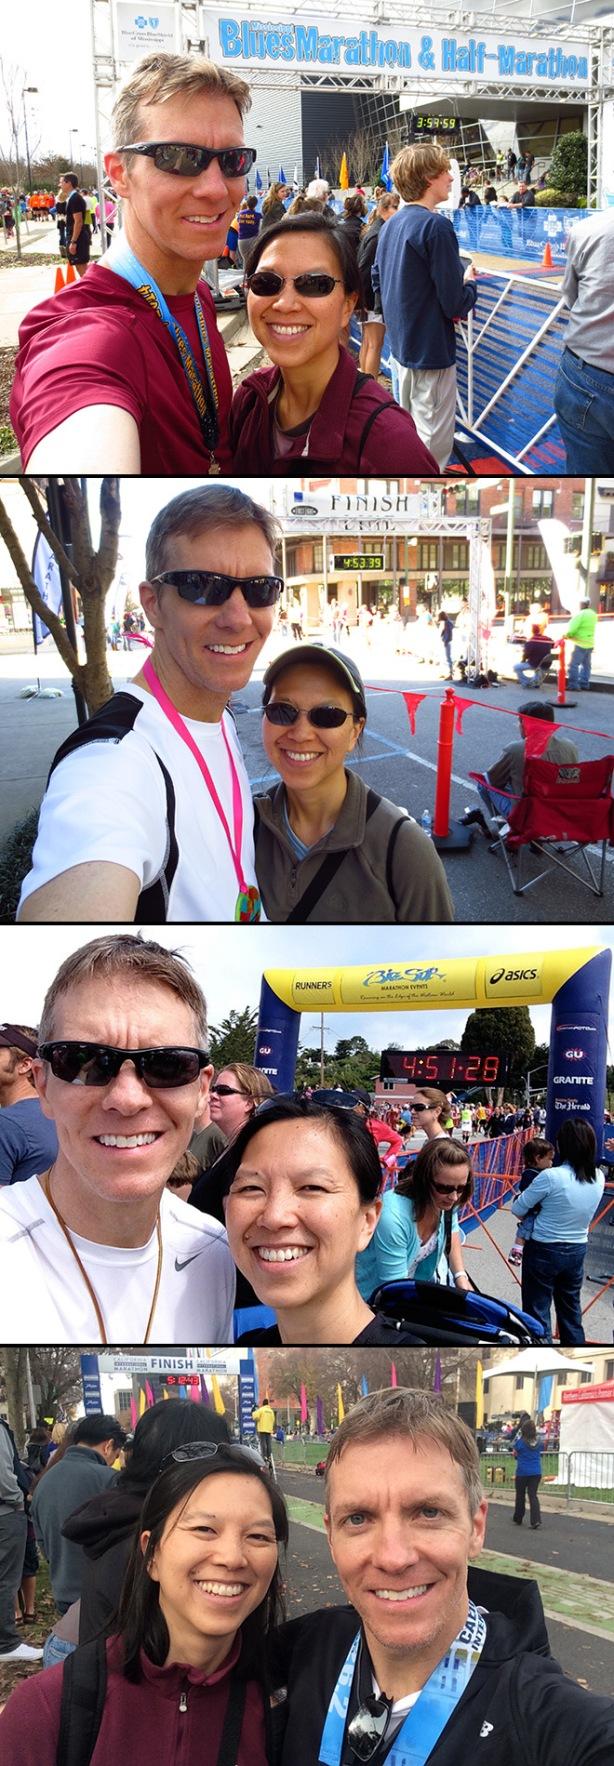 Mississippi Blues Marathon, First Light Marathon, Big Sur Marathon, California International Marathon finish line selfies